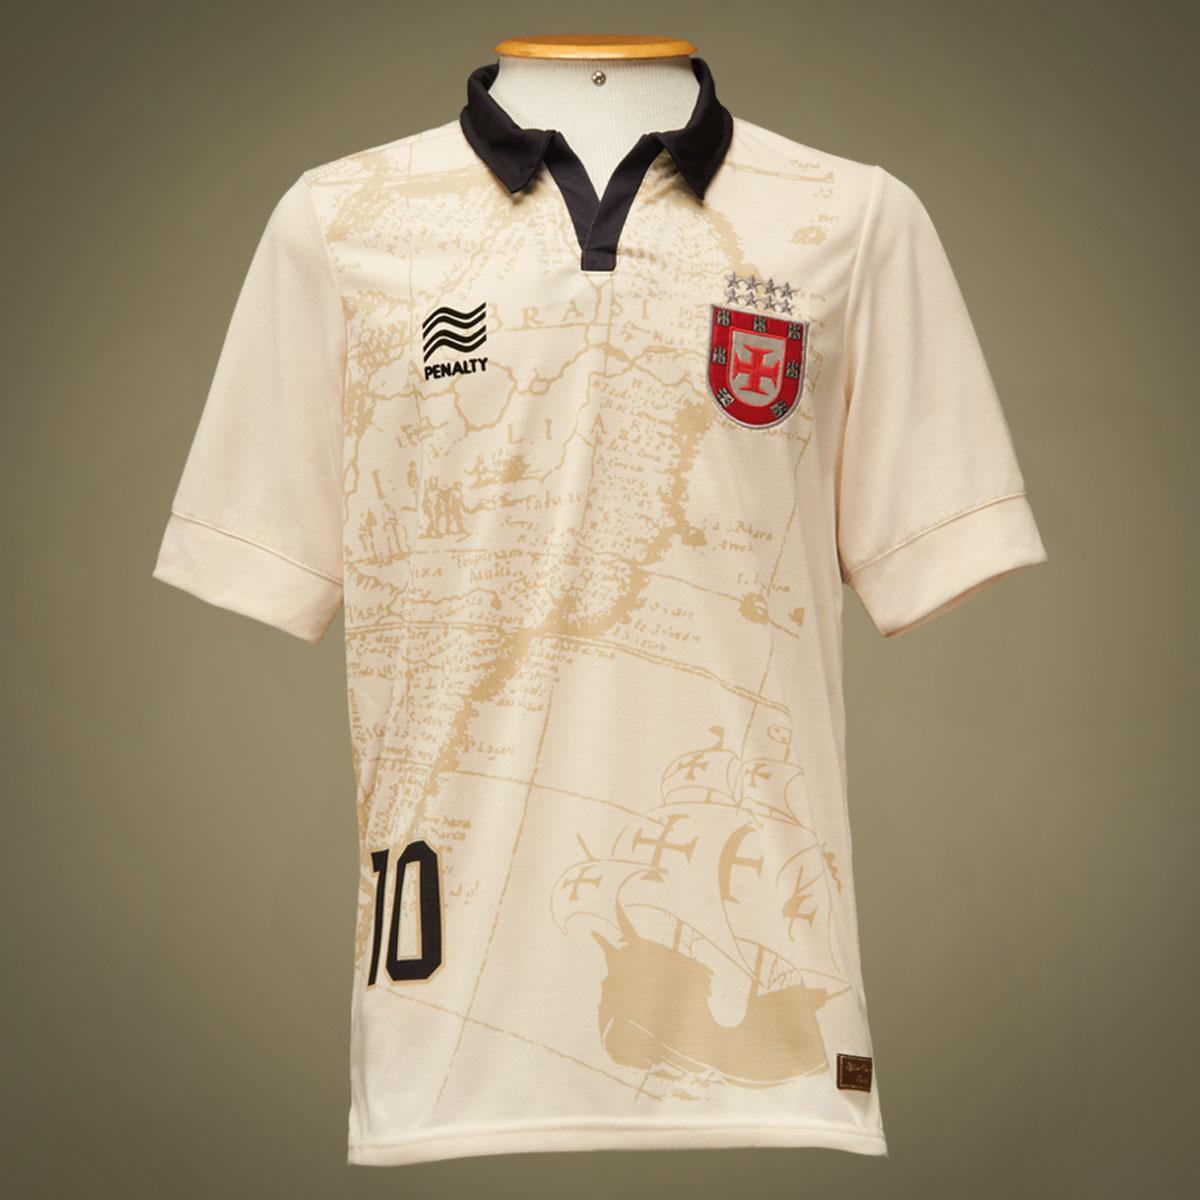 Camisas do Vasco da Gama  2013- Penalty (third) b0e62eefda70f